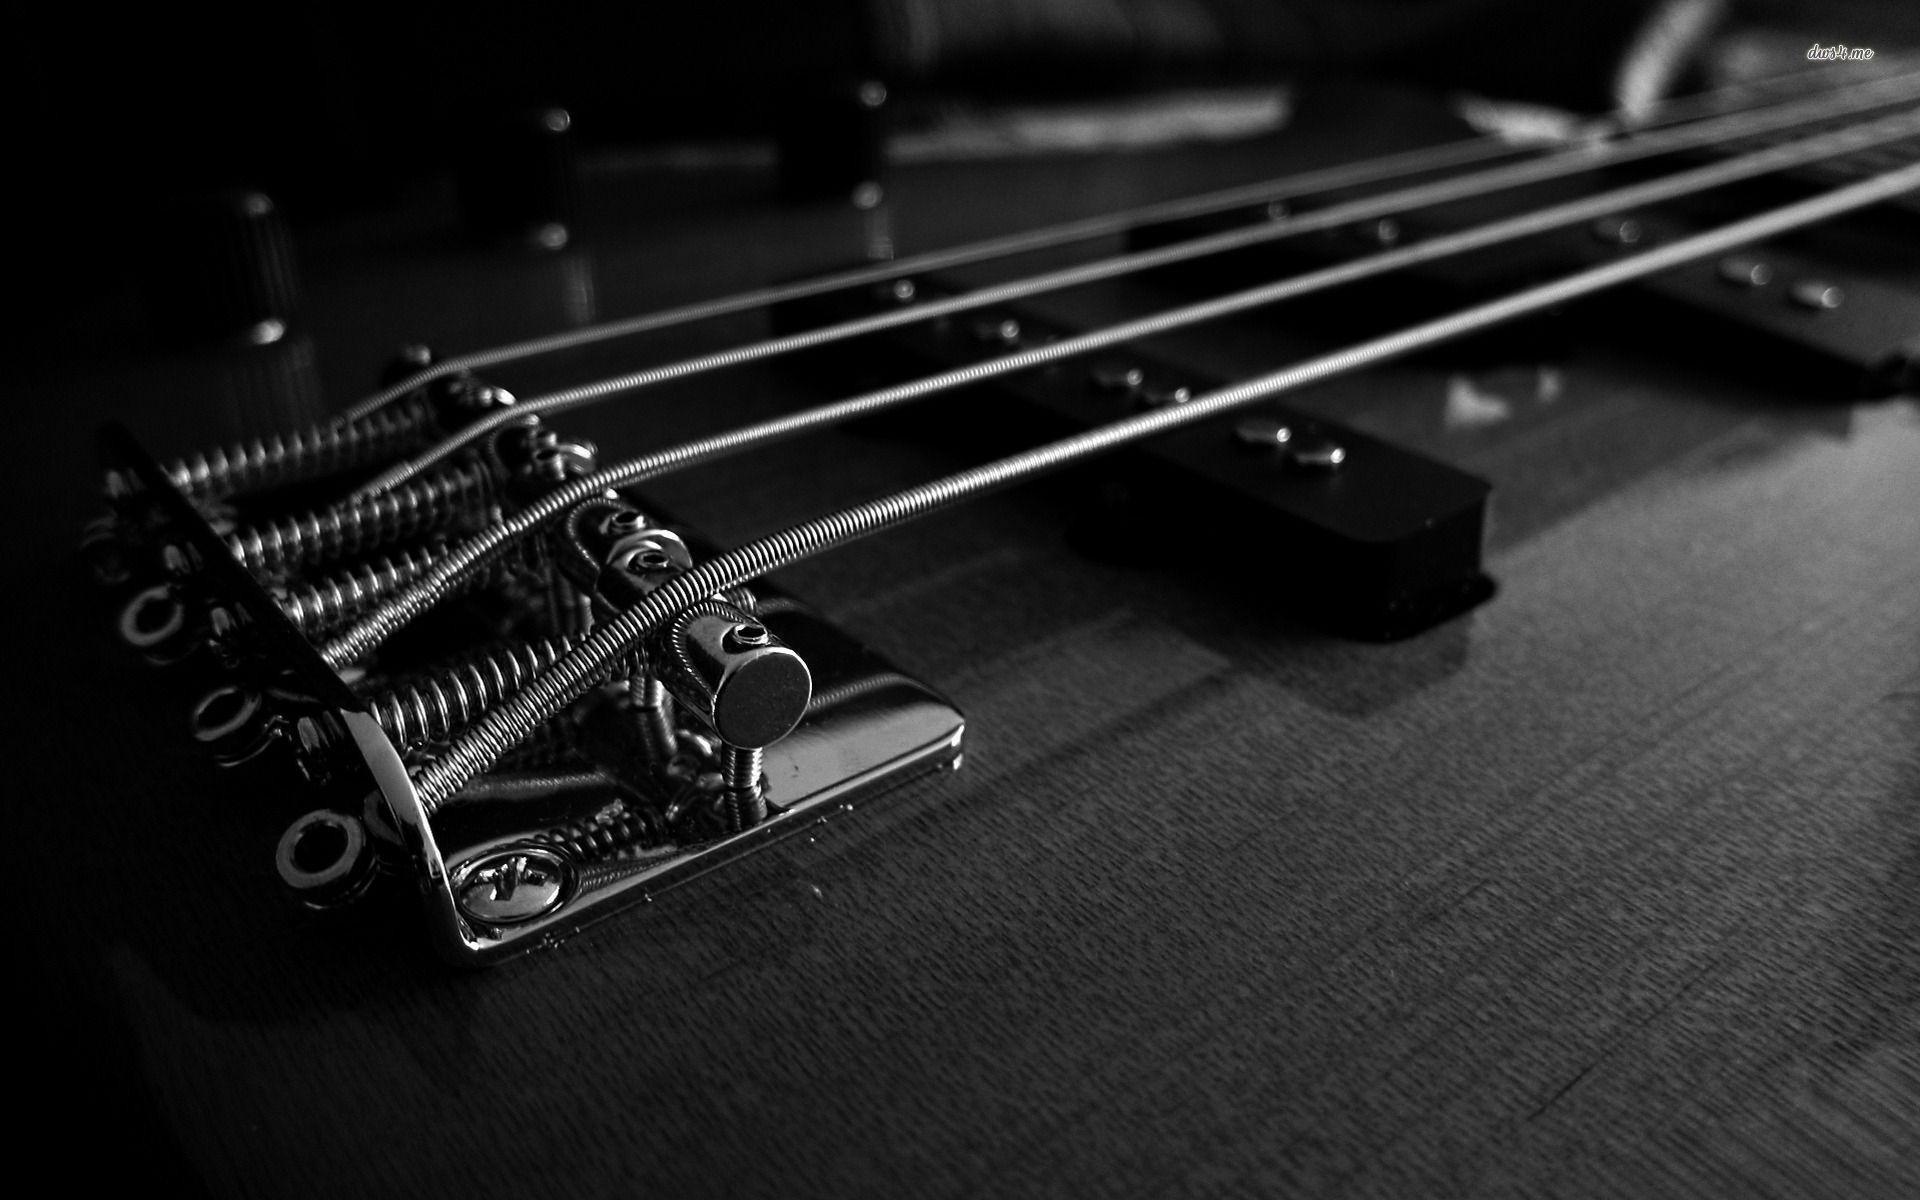 Wallpapers For > Bass Guitar Wallpapers For Desktop